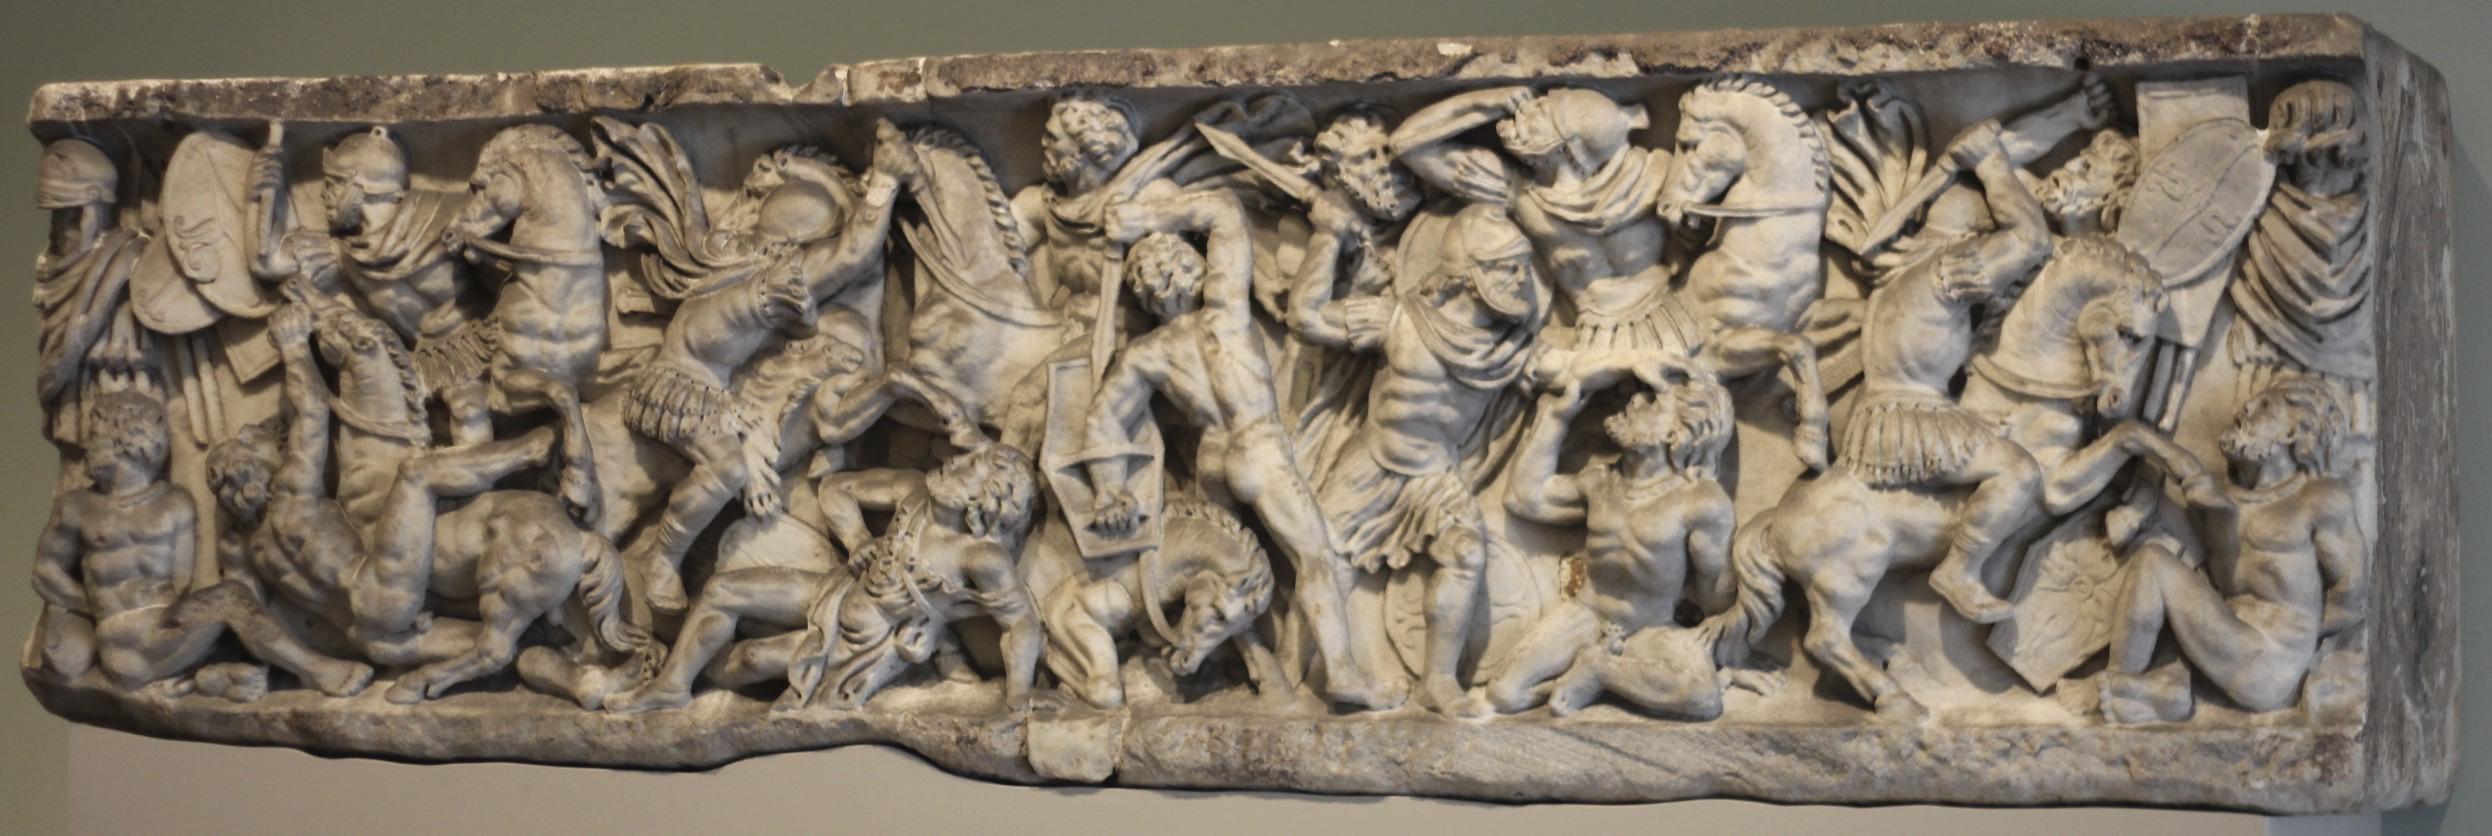 Roman_sarcophagus_with_battle_scene.jpg